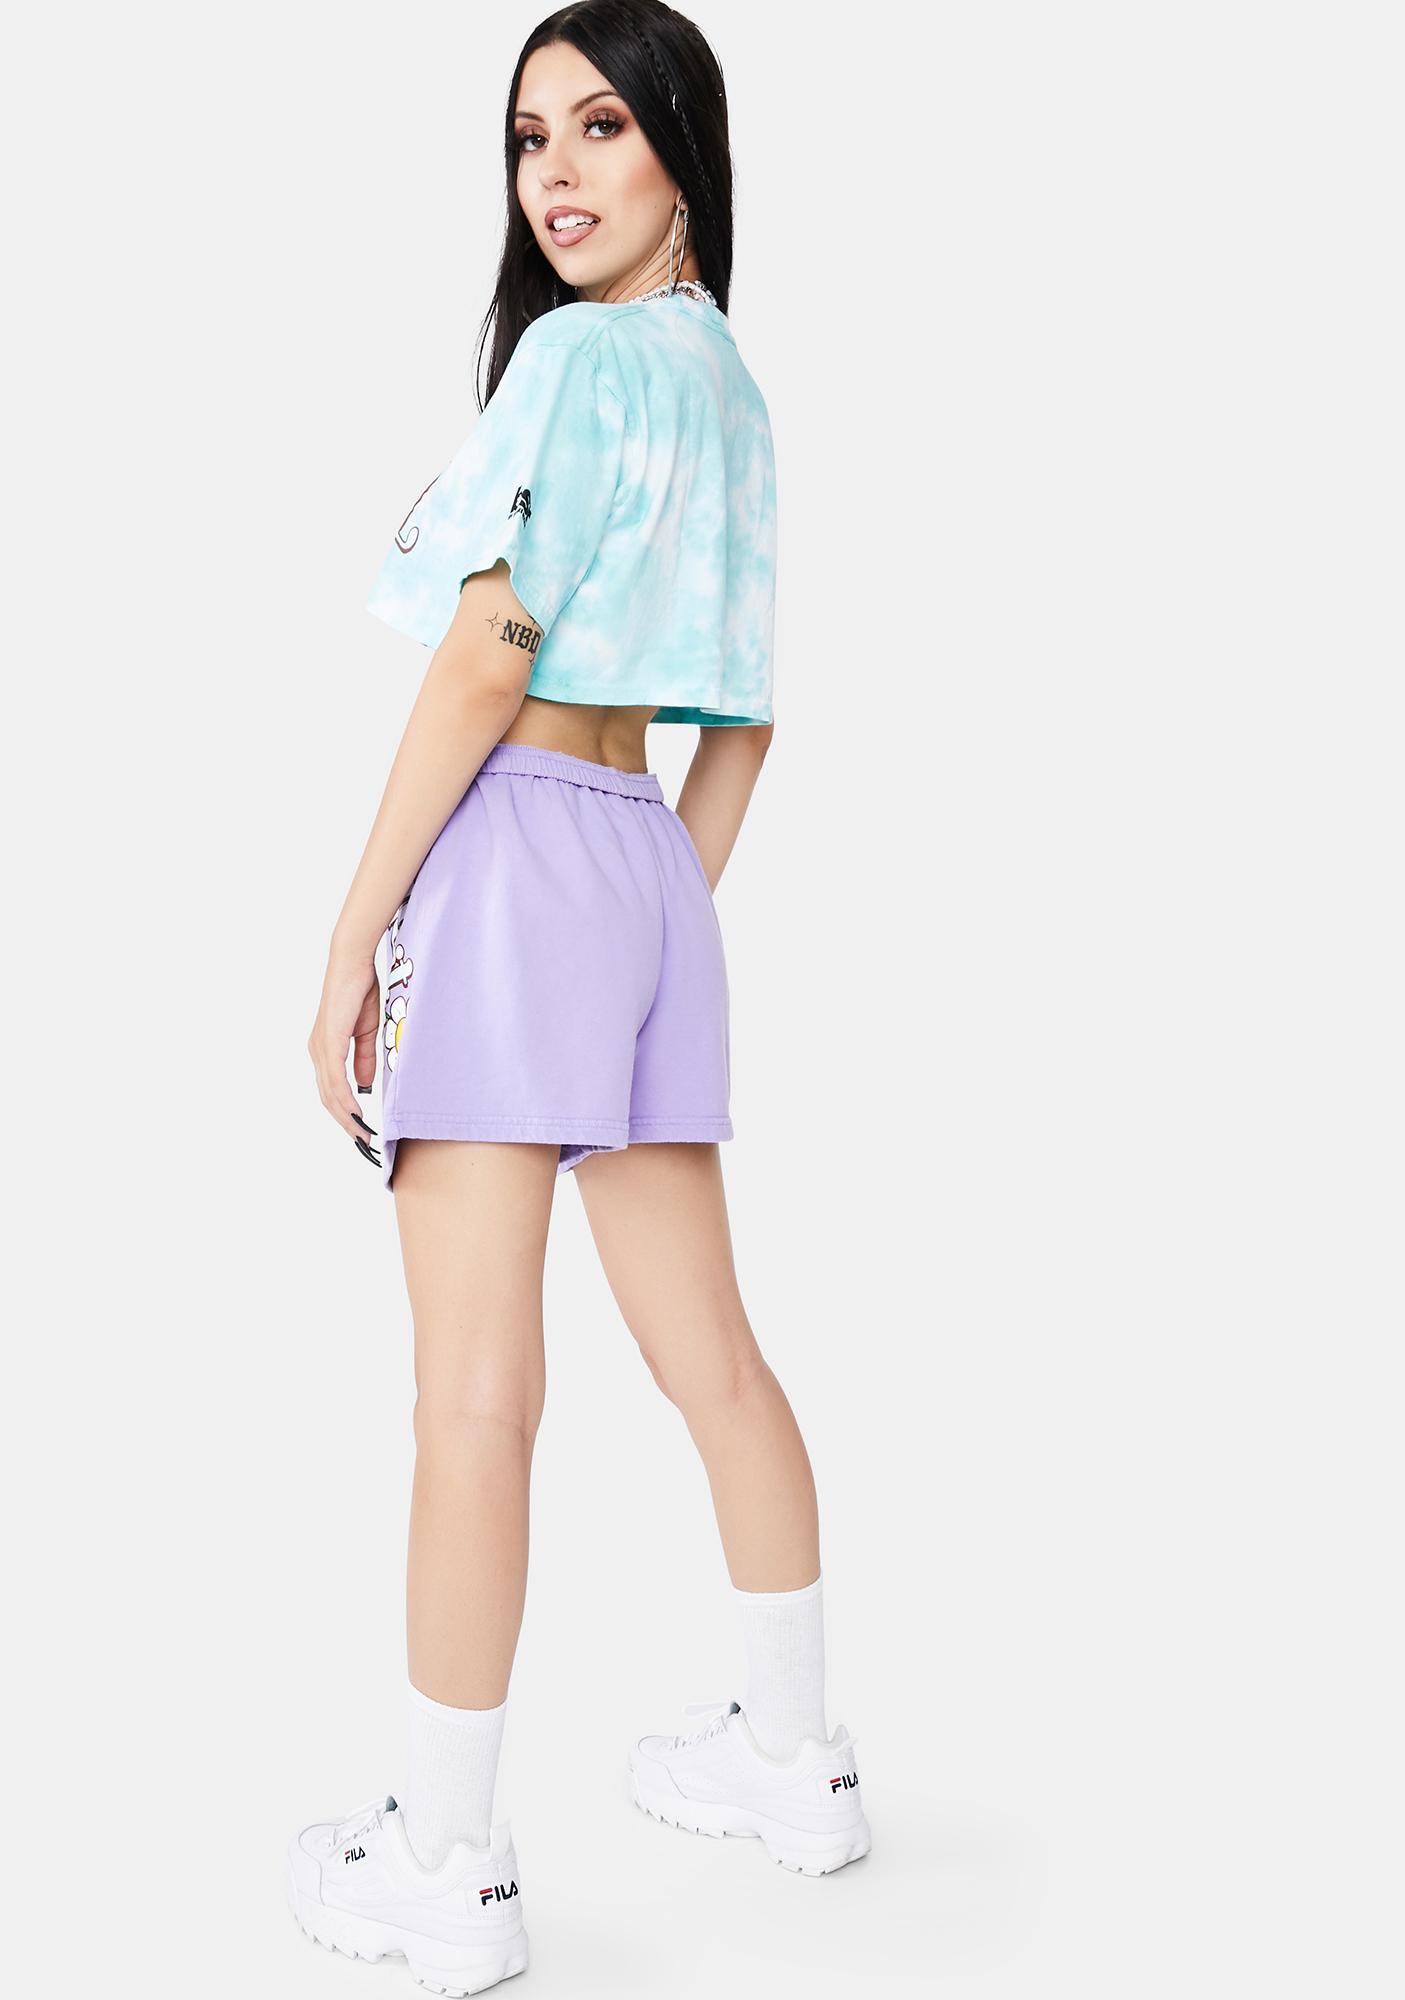 By Samii Ryan Lovely Sweat Shorts